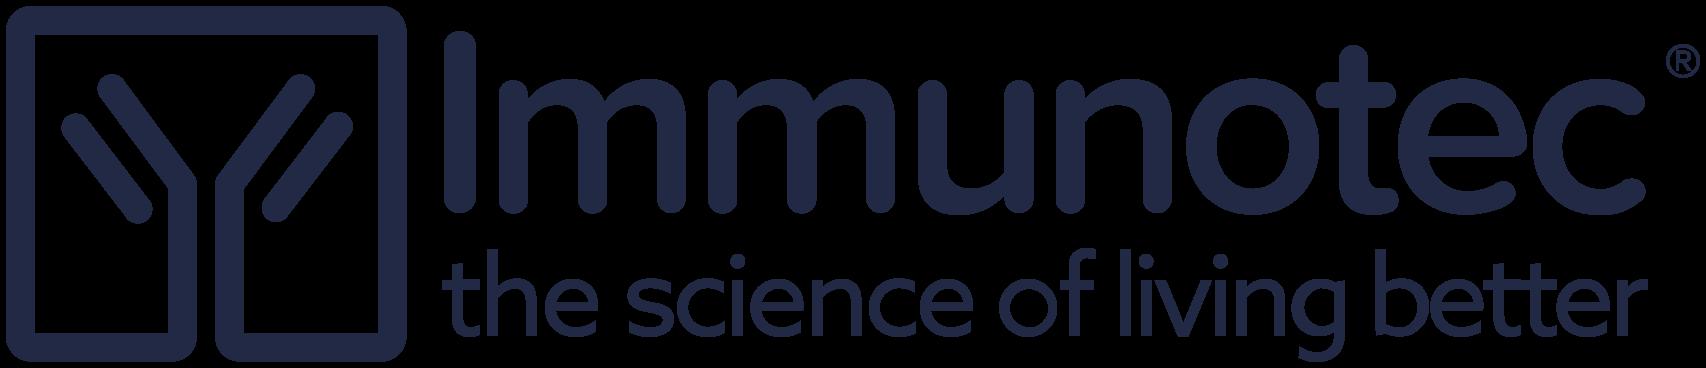 Logotipo de Immunotec